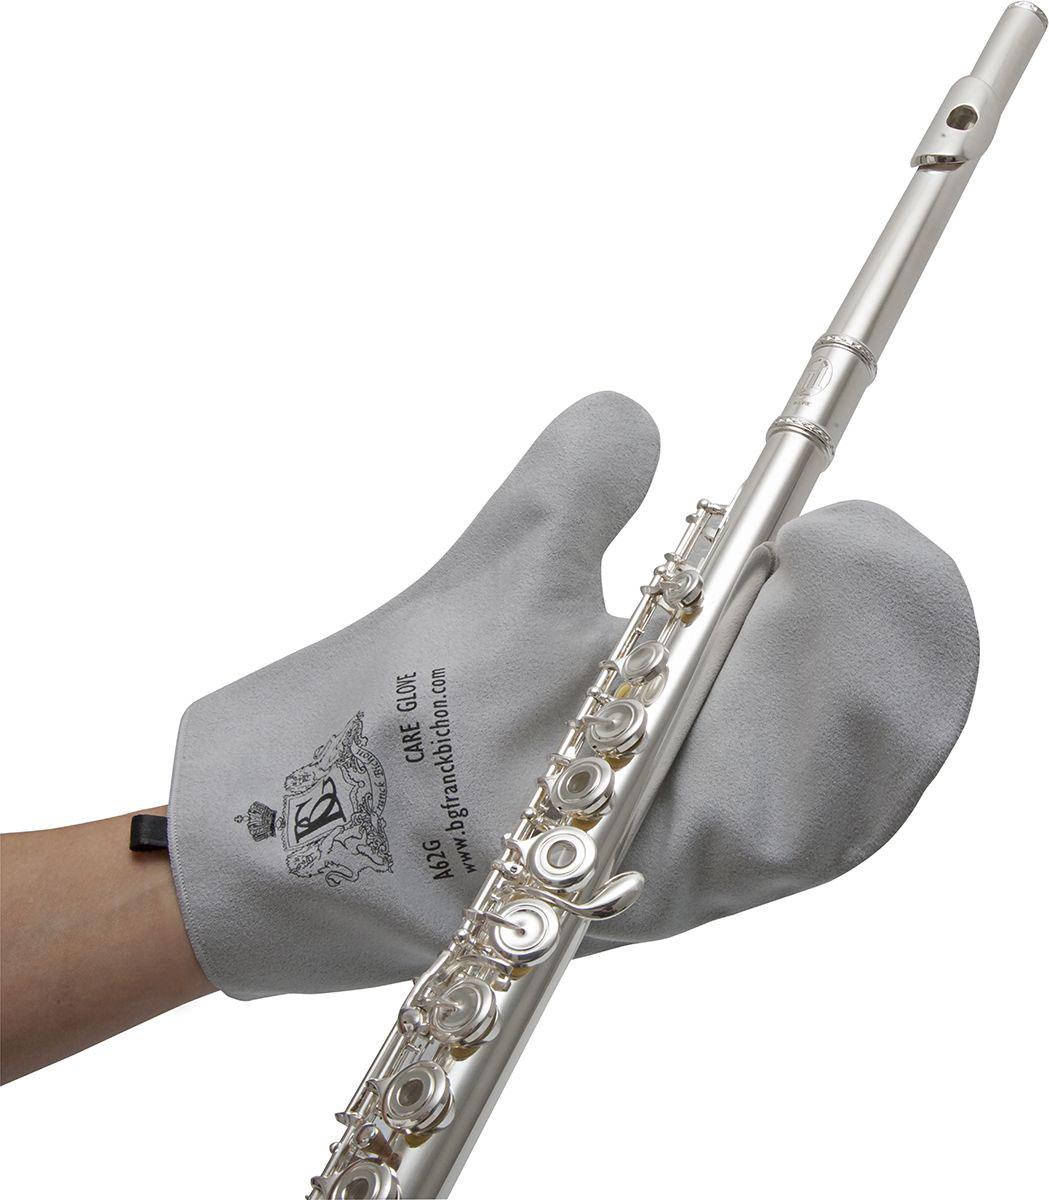 BG A62G Microfibre Care Glove